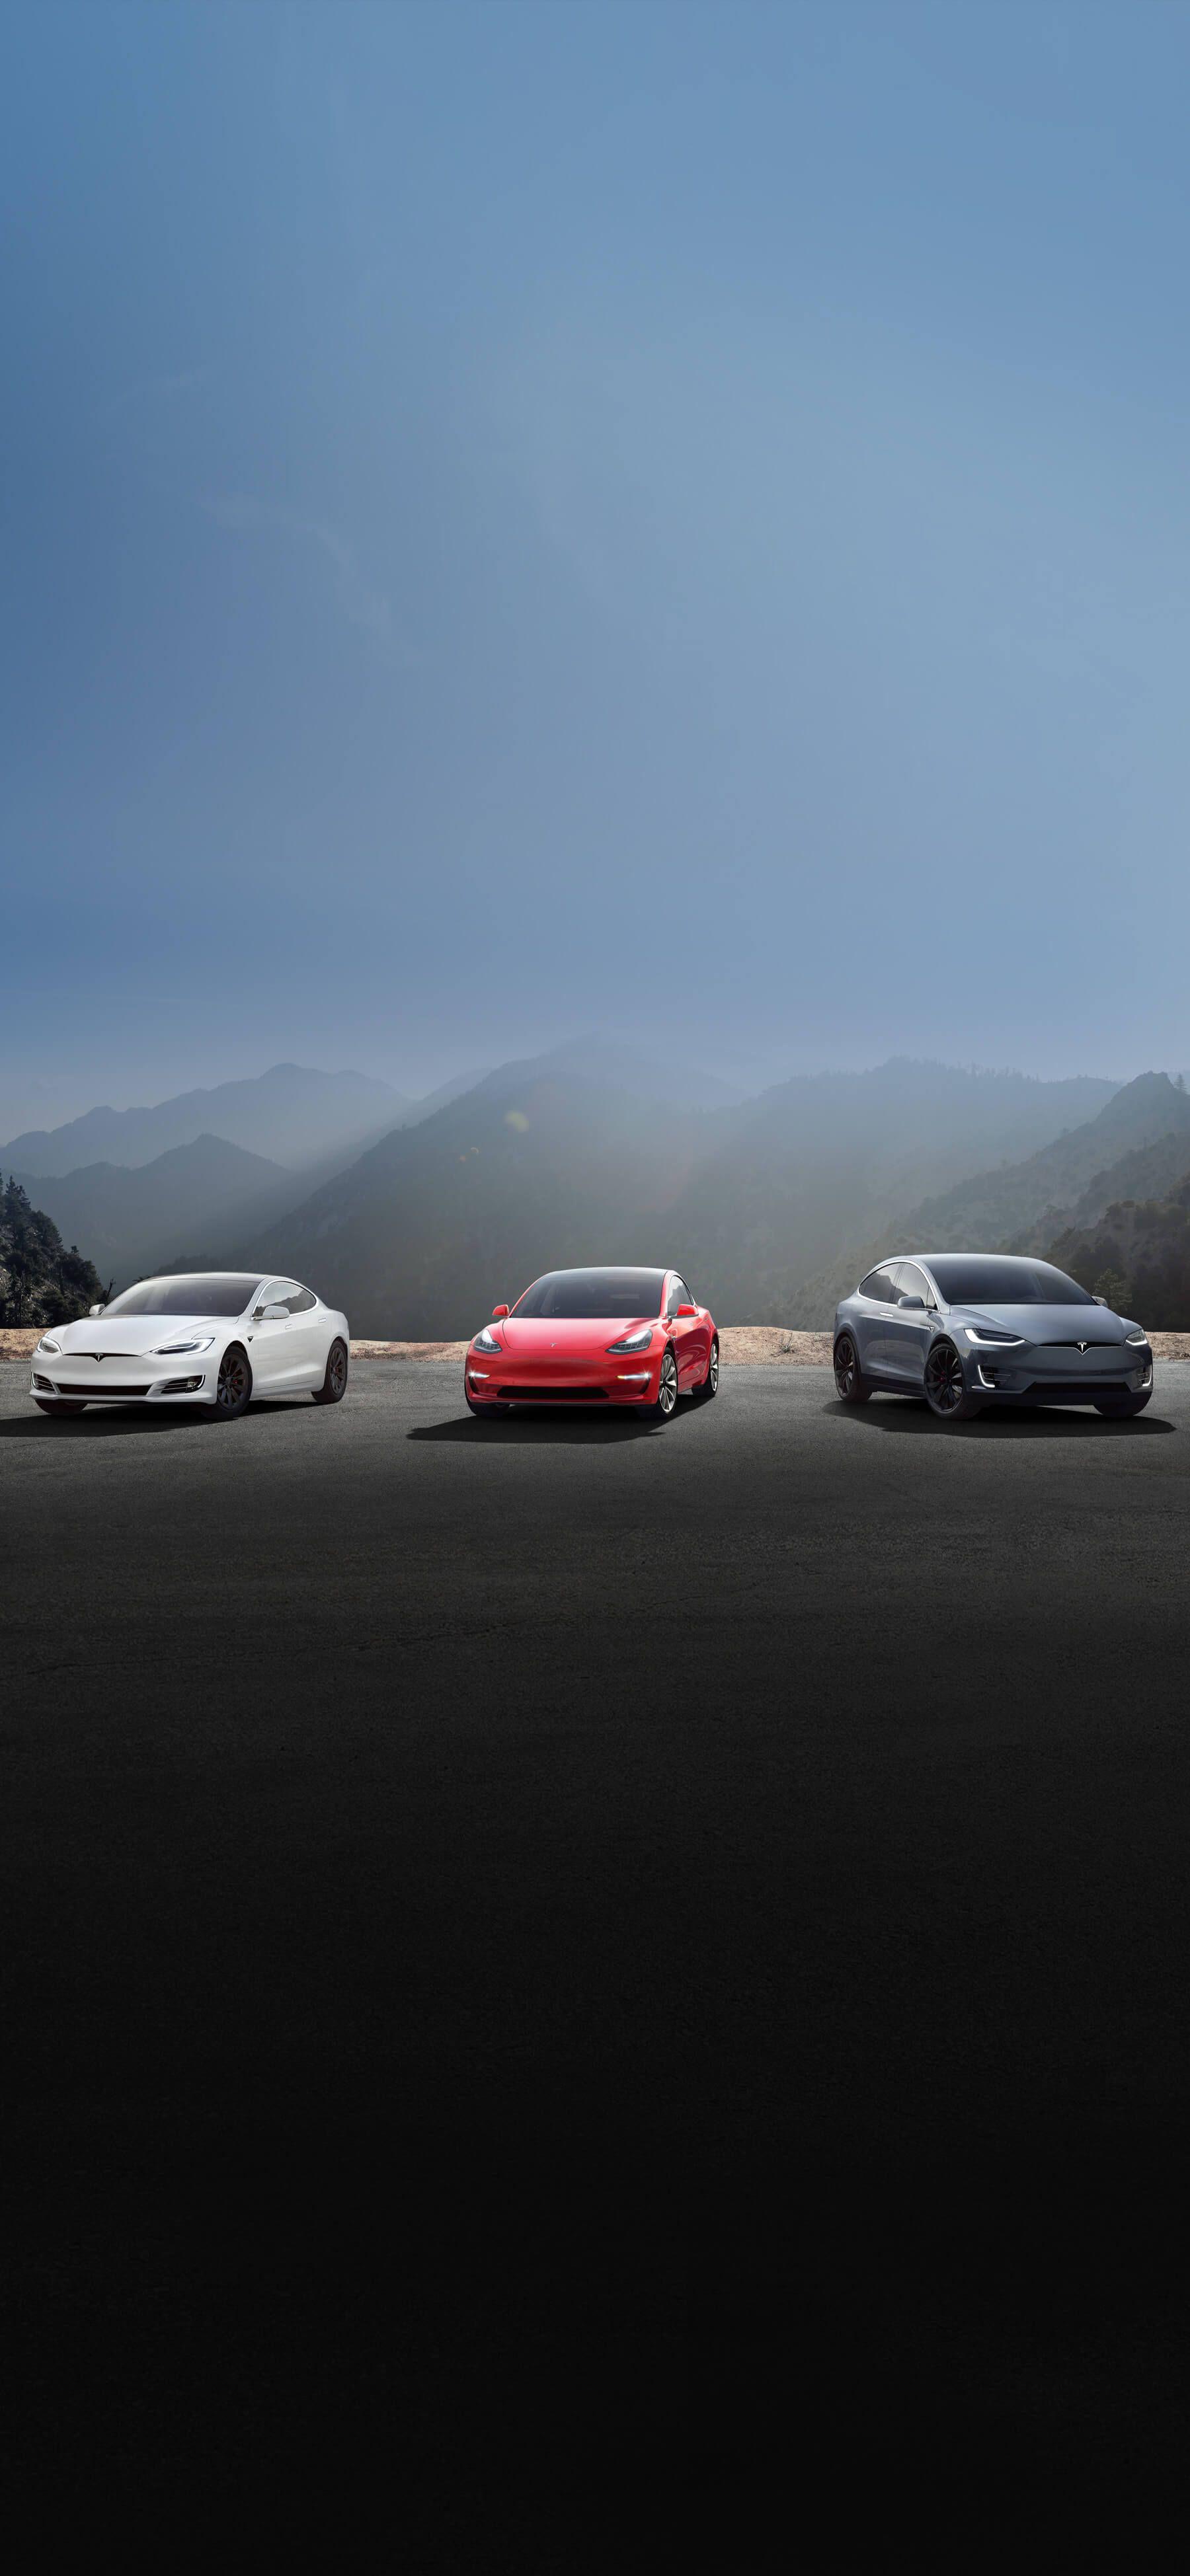 Electric Cars Solar Panels Clean Energy Storage Tesla Tesla